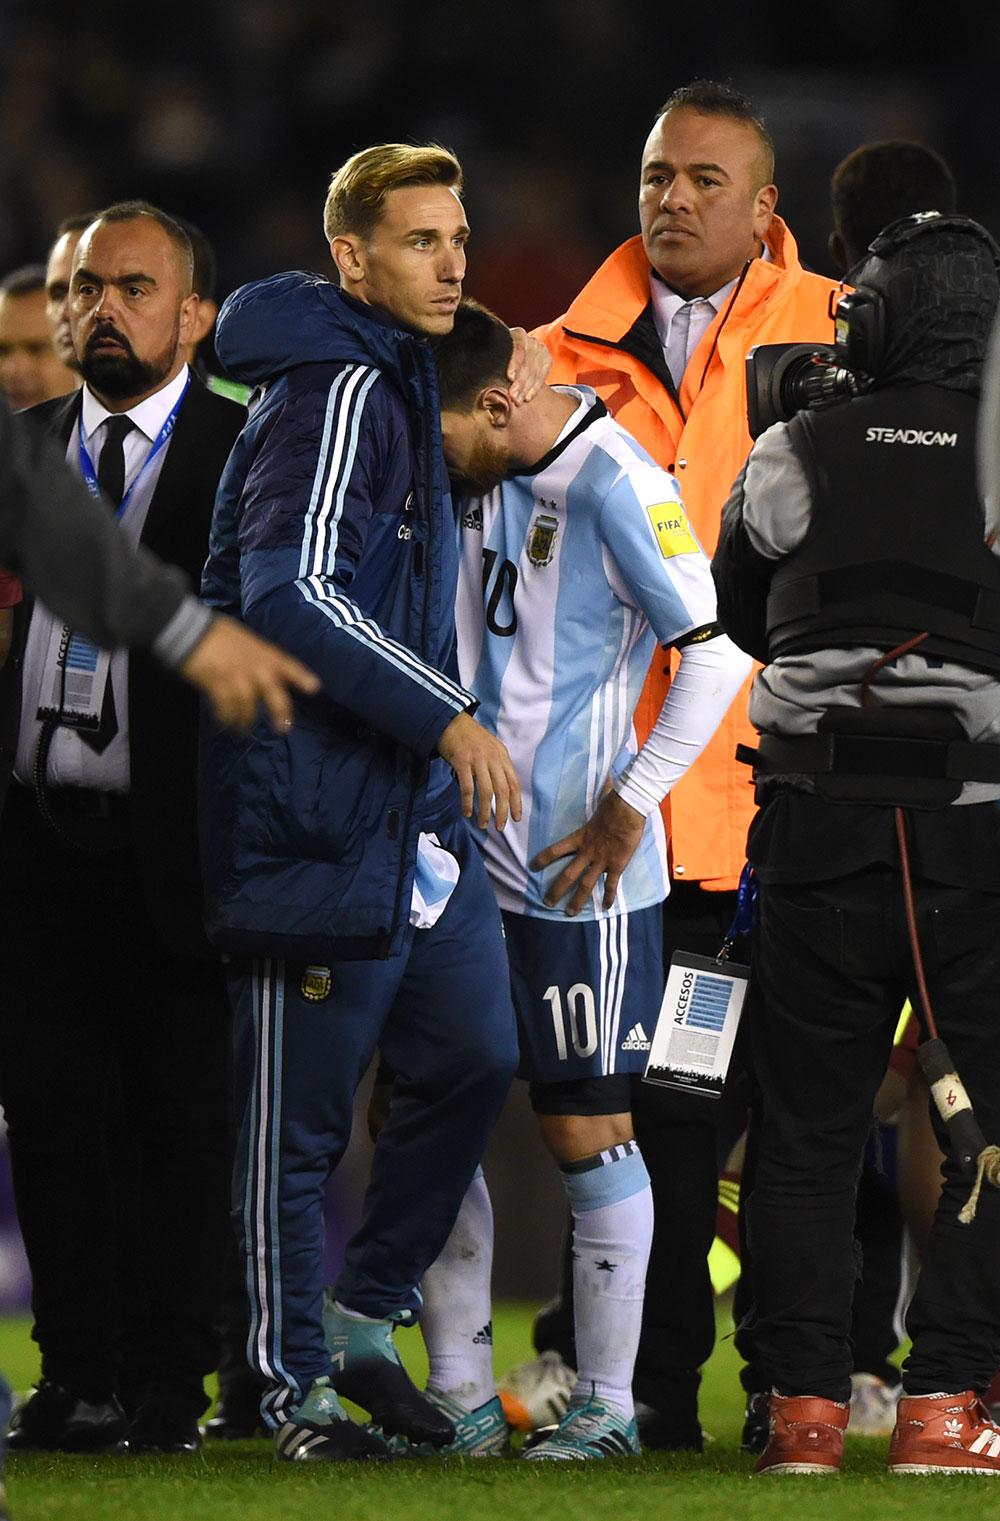 Lucas Biglia and Lionel Messi at the end of Argentina-Venezuela at Estadio Monumental Antonio Vespucio Liberti on September 5, 2017. (EITAN ABRAMOVICH/AFP/Getty Images)